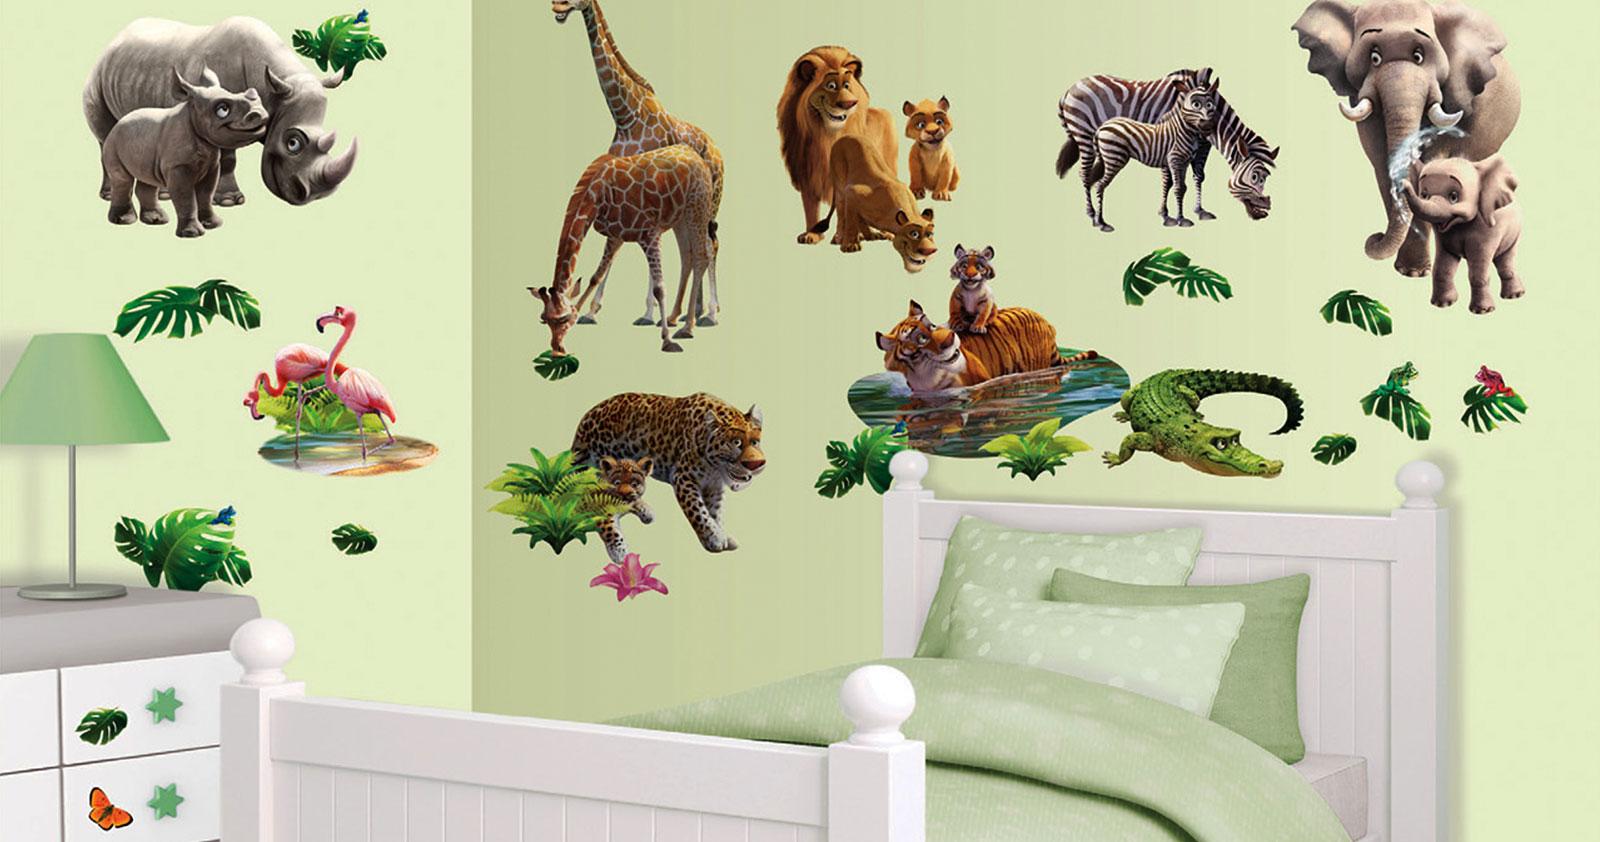 wandtattoo dschungel tiere afrika walltastic wandsticker. Black Bedroom Furniture Sets. Home Design Ideas